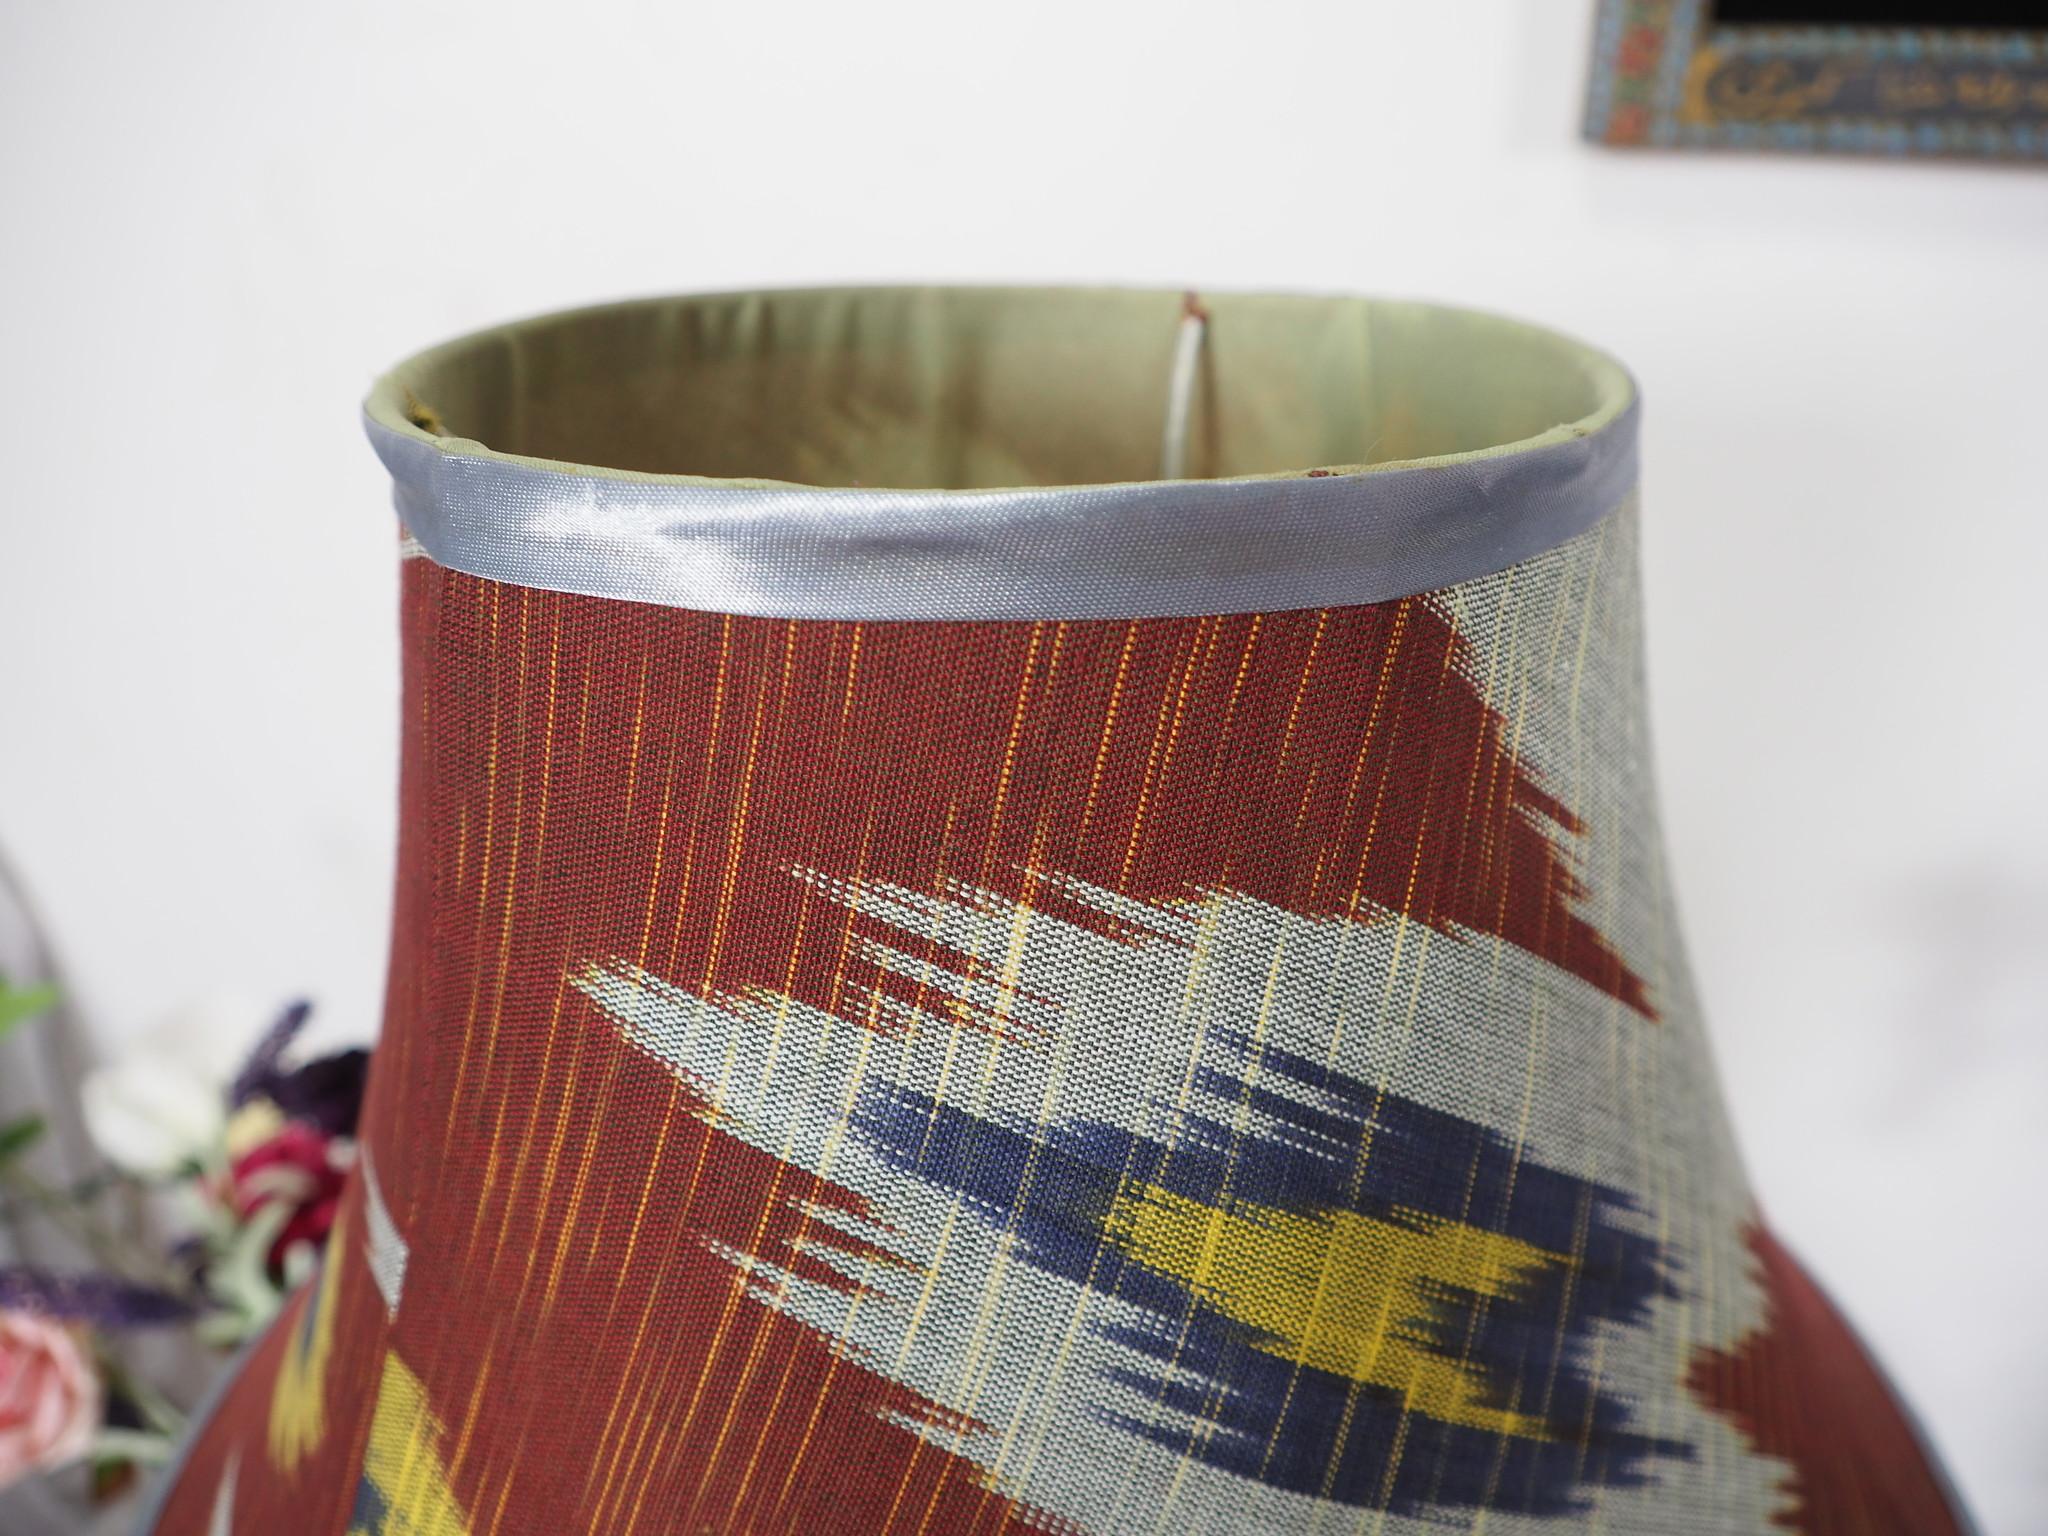 extravagant orient Uzbek Ikat stoff Schirm Lampenschirm Leuchtenschirm lampshade Nr:F